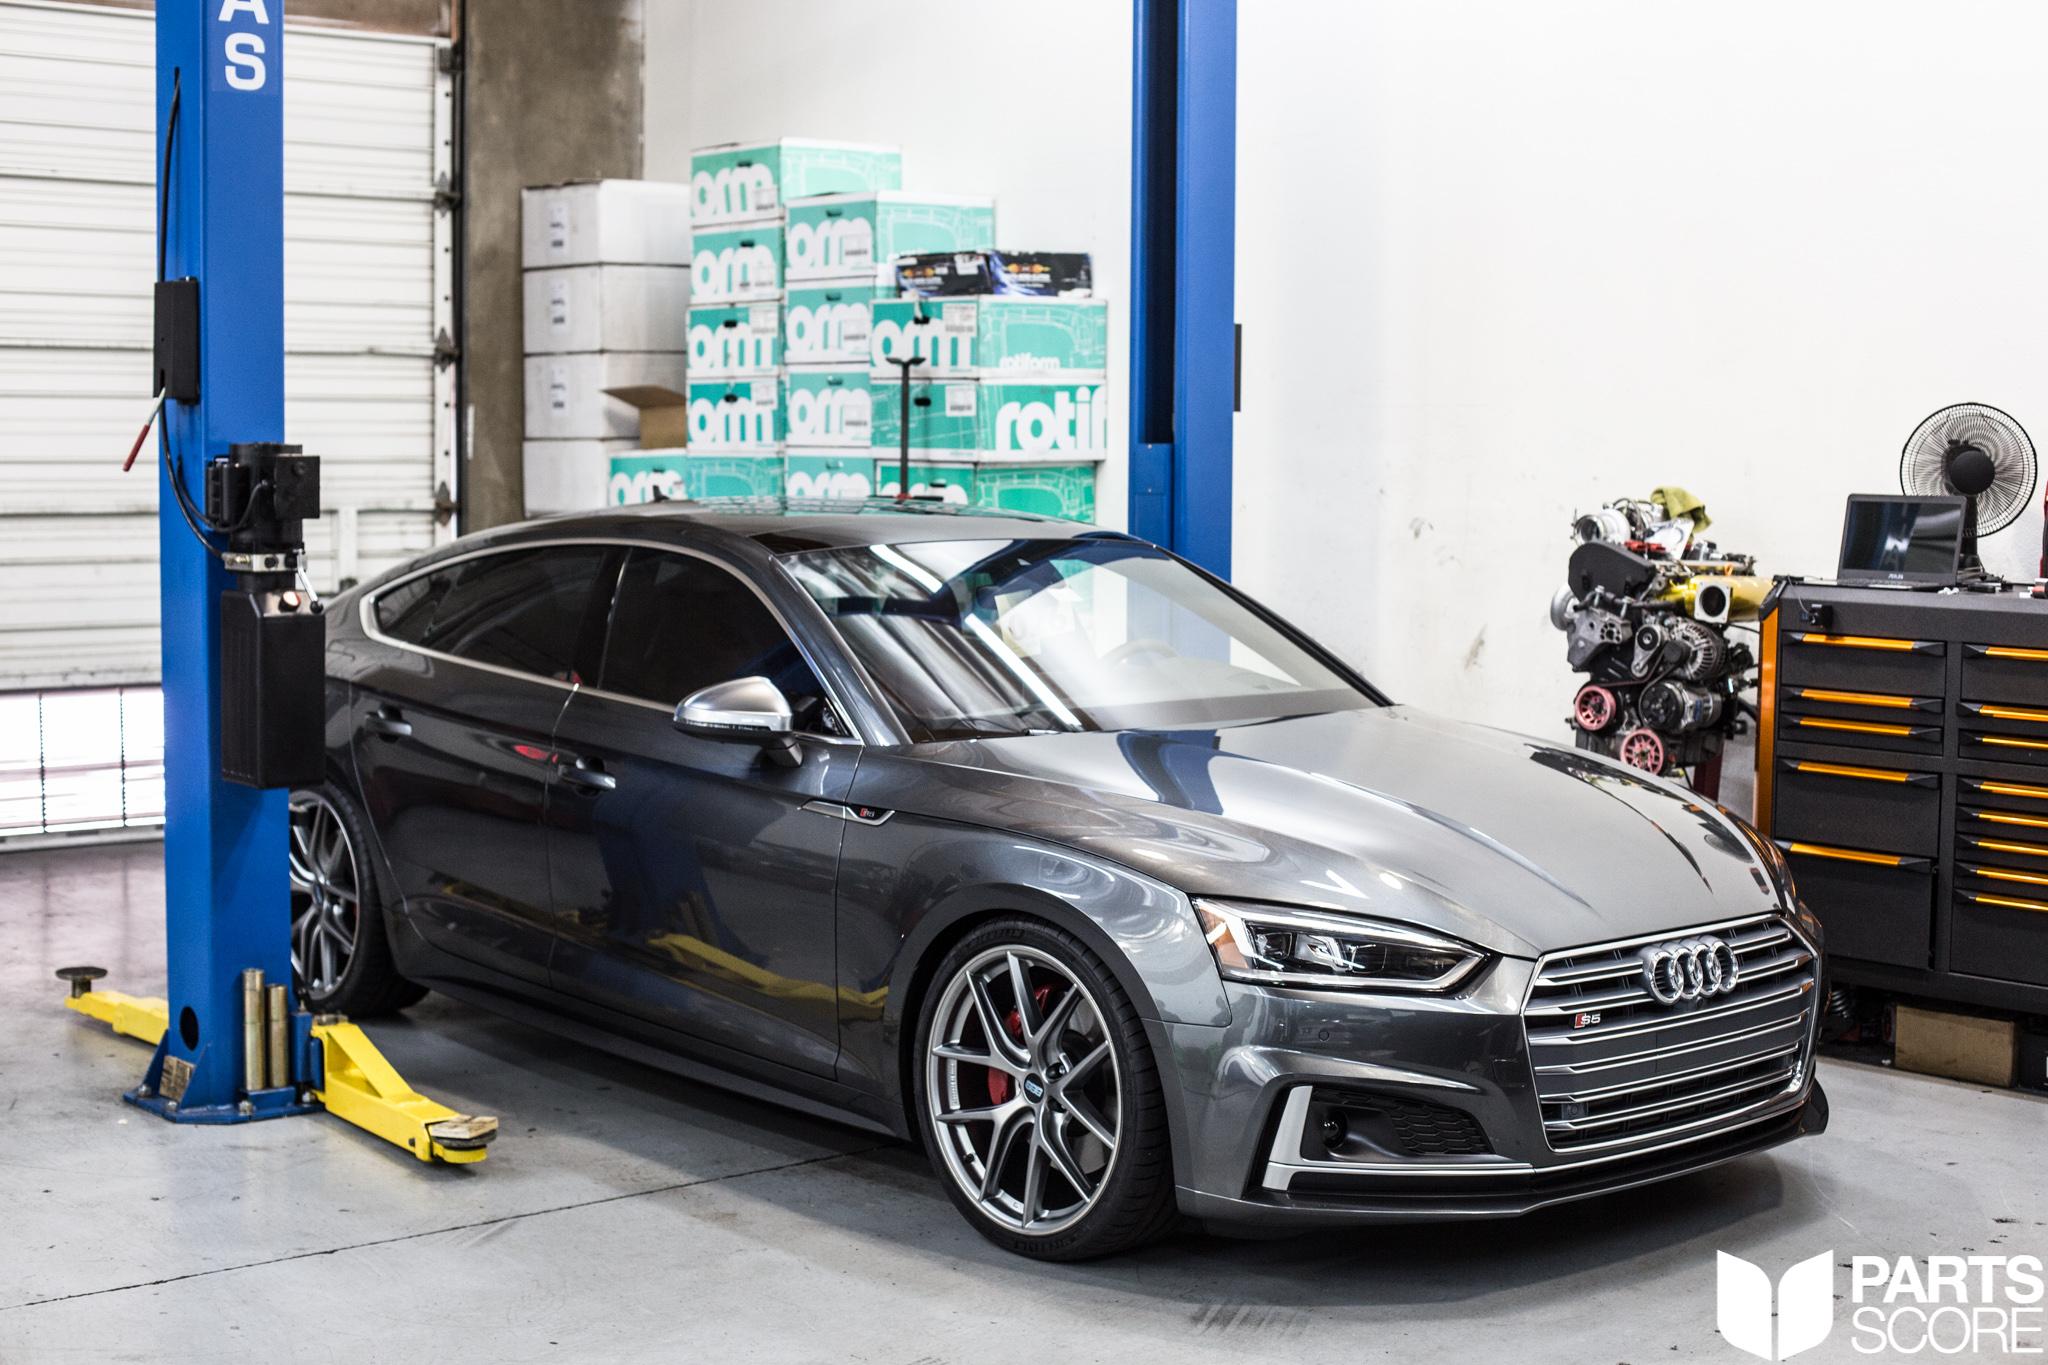 034, 034 motorsport, 034Motorsport, arizona, Audi, audi b9 s4, audi b9 s5, audi has kit, audi performance, audi s4, audi s5 has kit, audi s5 kw, b9 a4 grill, b9 a4 rs grill, b9 a4 wheels, b9 a5 grill, b9 a5 rs grill, b9 a5 wheels, b9 audi aftermarket wheels, b9 audi has kit, b9 audi hre wheels, b9 audi lowering, b9 audi mods, b9 audi springs, b9 audi wheel, b9 audi wheels, b9 bbs wheels, b9 h and r springs, b9 h r coilovers, b9 h&r springs, b9 has kit, b9 modifications, b9 performance, b9 s4, b9 s4 034, b9 s4 034 motorsports, b9 s4 apr, b9 s4 awe tuning, b9 s4 carbon fiber, b9 s4 downpipe, b9 s4 exhaust, b9 s4 flash, b9 s4 flash tune, b9 s4 front lip, b9 s4 giac, b9 s4 giac tune, b9 s4 grill, b9 s4 h and r coilovers, b9 s4 h r coilovers, b9 s4 h&r coilovers, b9 s4 h&r springs, b9 s4 has kit, b9 s4 intake, b9 s4 kw coilovers, b9 s4 kw has kit, b9 s4 kwv1, b9 s4 kwv2, b9 s4 kwv3, b9 s4 lip, b9 s4 milltek, b9 s4 modification, b9 s4 mods, b9 s4 navigation, b9 s4 ohlins, b9 s4 ohlins road and track, b9 s4 painted reflectors, b9 s4 performance, b9 s4 performance mods, b9 s4 power, b9 s4 spacers, b9 s4 spoiler, b9 s4 springs, b9 s4 tune, b9 s4 wheels, b9 s5, b9 s5 apr, b9 s5 awe tuning, b9 s5 carbon fiber, b9 s5 downpipe, b9 s5 exhaust, b9 s5 front lip, b9 s5 giac, b9 s5 grill, b9 s5 h&r springs, b9 s5 has kit, b9 s5 intake, b9 s5 kw has kit, b9 s5 milltek, b9 s5 mods, b9 s5 painted reflectors, b9 s5 performance, b9 s5 power, b9 s5 sportback wheels, b9 s5 springs, b9 s5 wheels, b9 suspension b9 audi suspension, b9 wheels, BBS, bbs usa, bbs wheels, bbs wheels b9, giac flash, giac tune, giactuned, glacier white, h and r coilovers b9, has kit, height adjustable spring kit, kw coilovers b9, magma red, mesh, mesh grill, michelin tires, o34, o34 motorsport, o34motorsport, parts score, rs grill, rs4 grill, rs4 s4 grill, s4 b9 cts turbo, scottsdale, strut bar, strut tower, strut tower brace, subframe insert, toyo tires